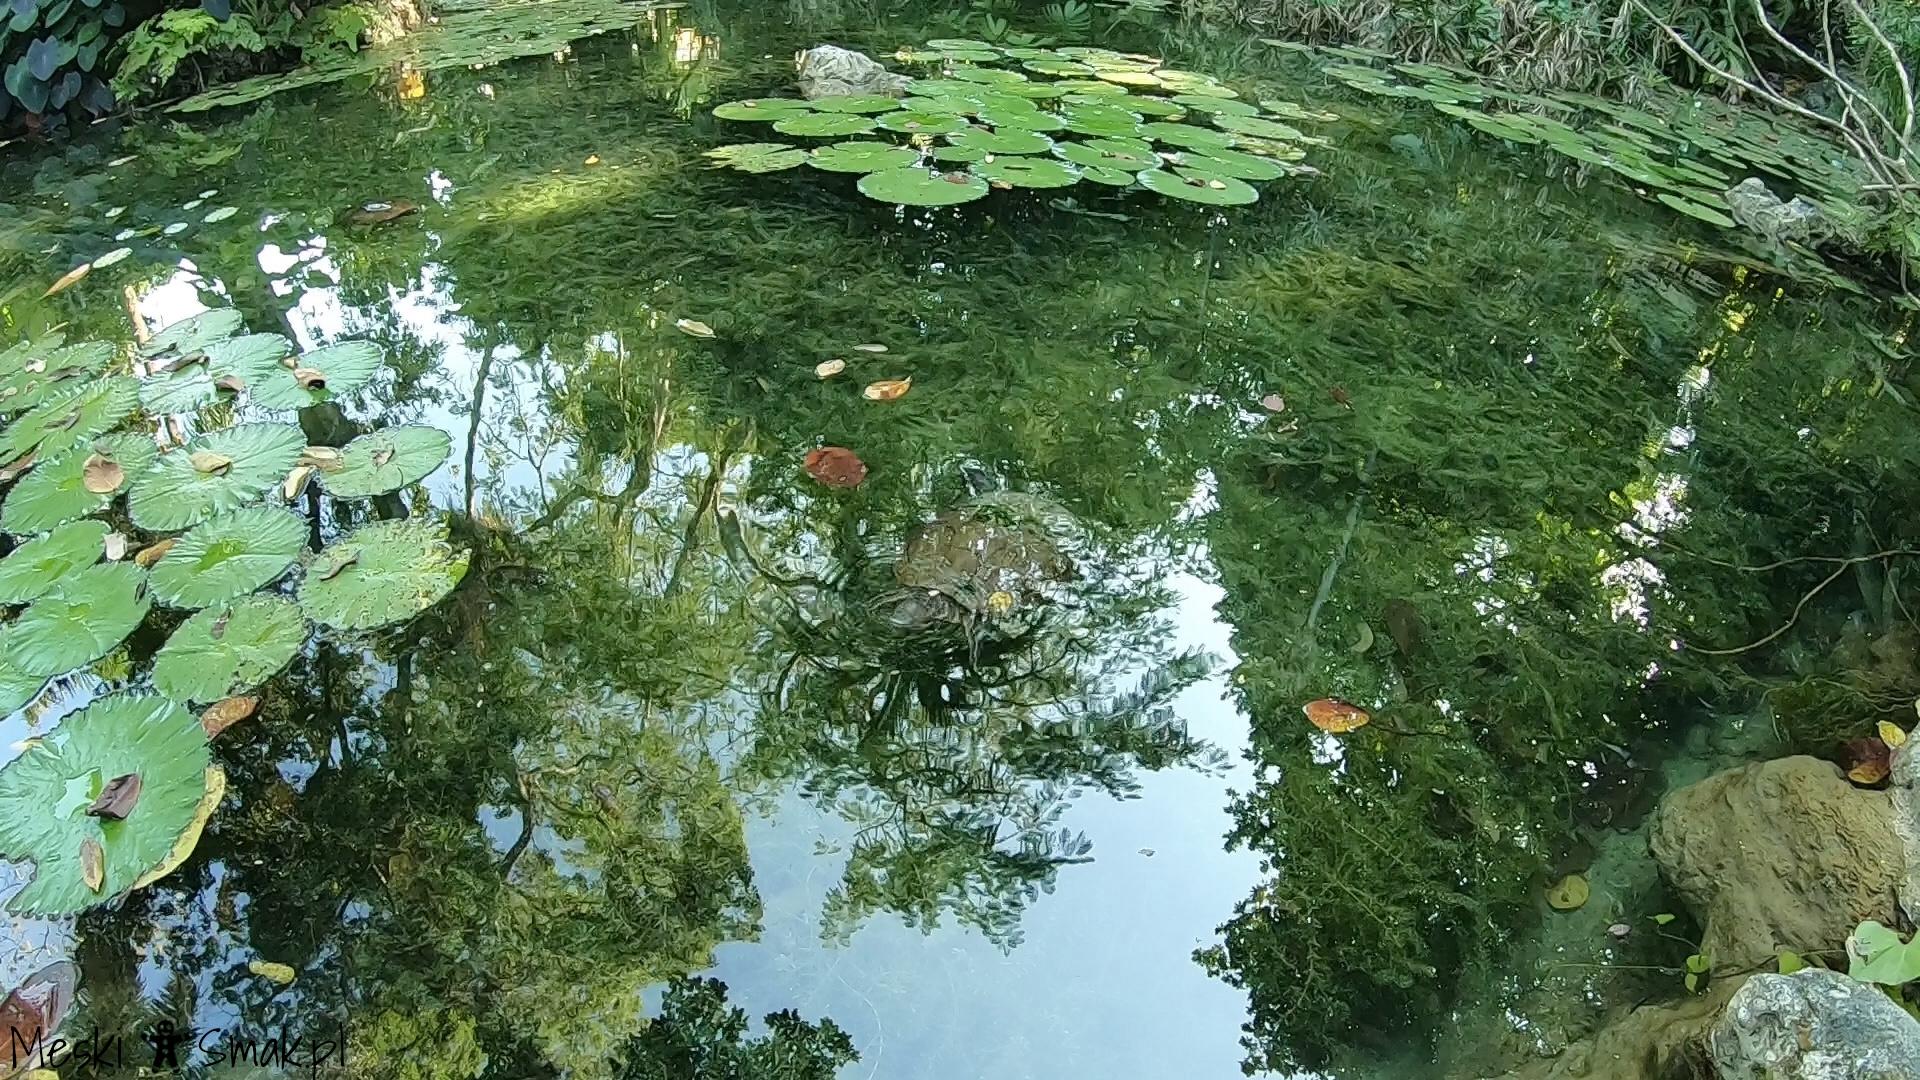 podróż poślubna_The Turtle River Falls & Gardens 7